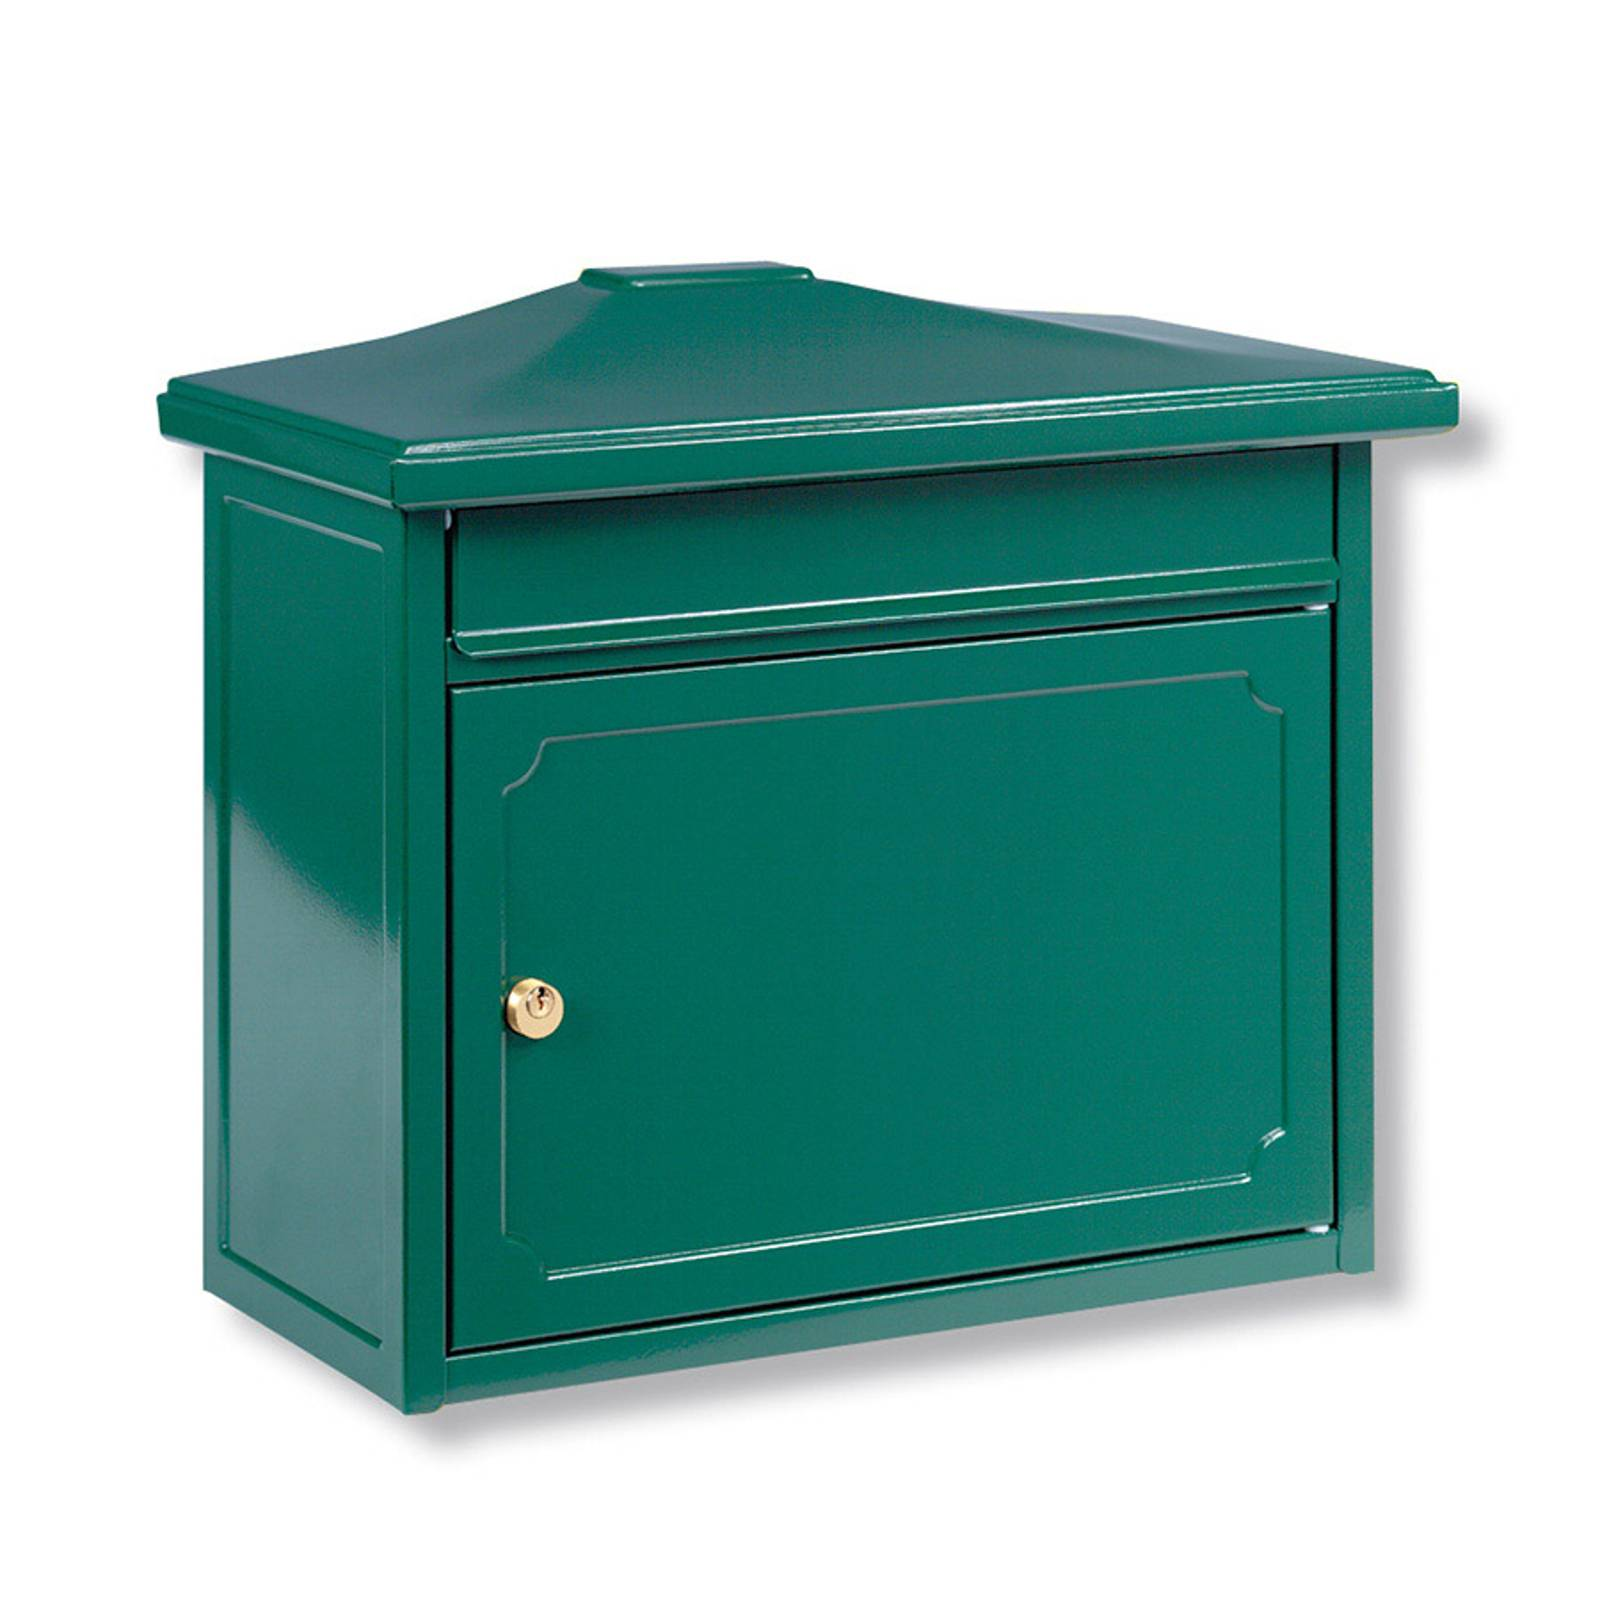 Kopenhagen-postilaatikko, vihreä